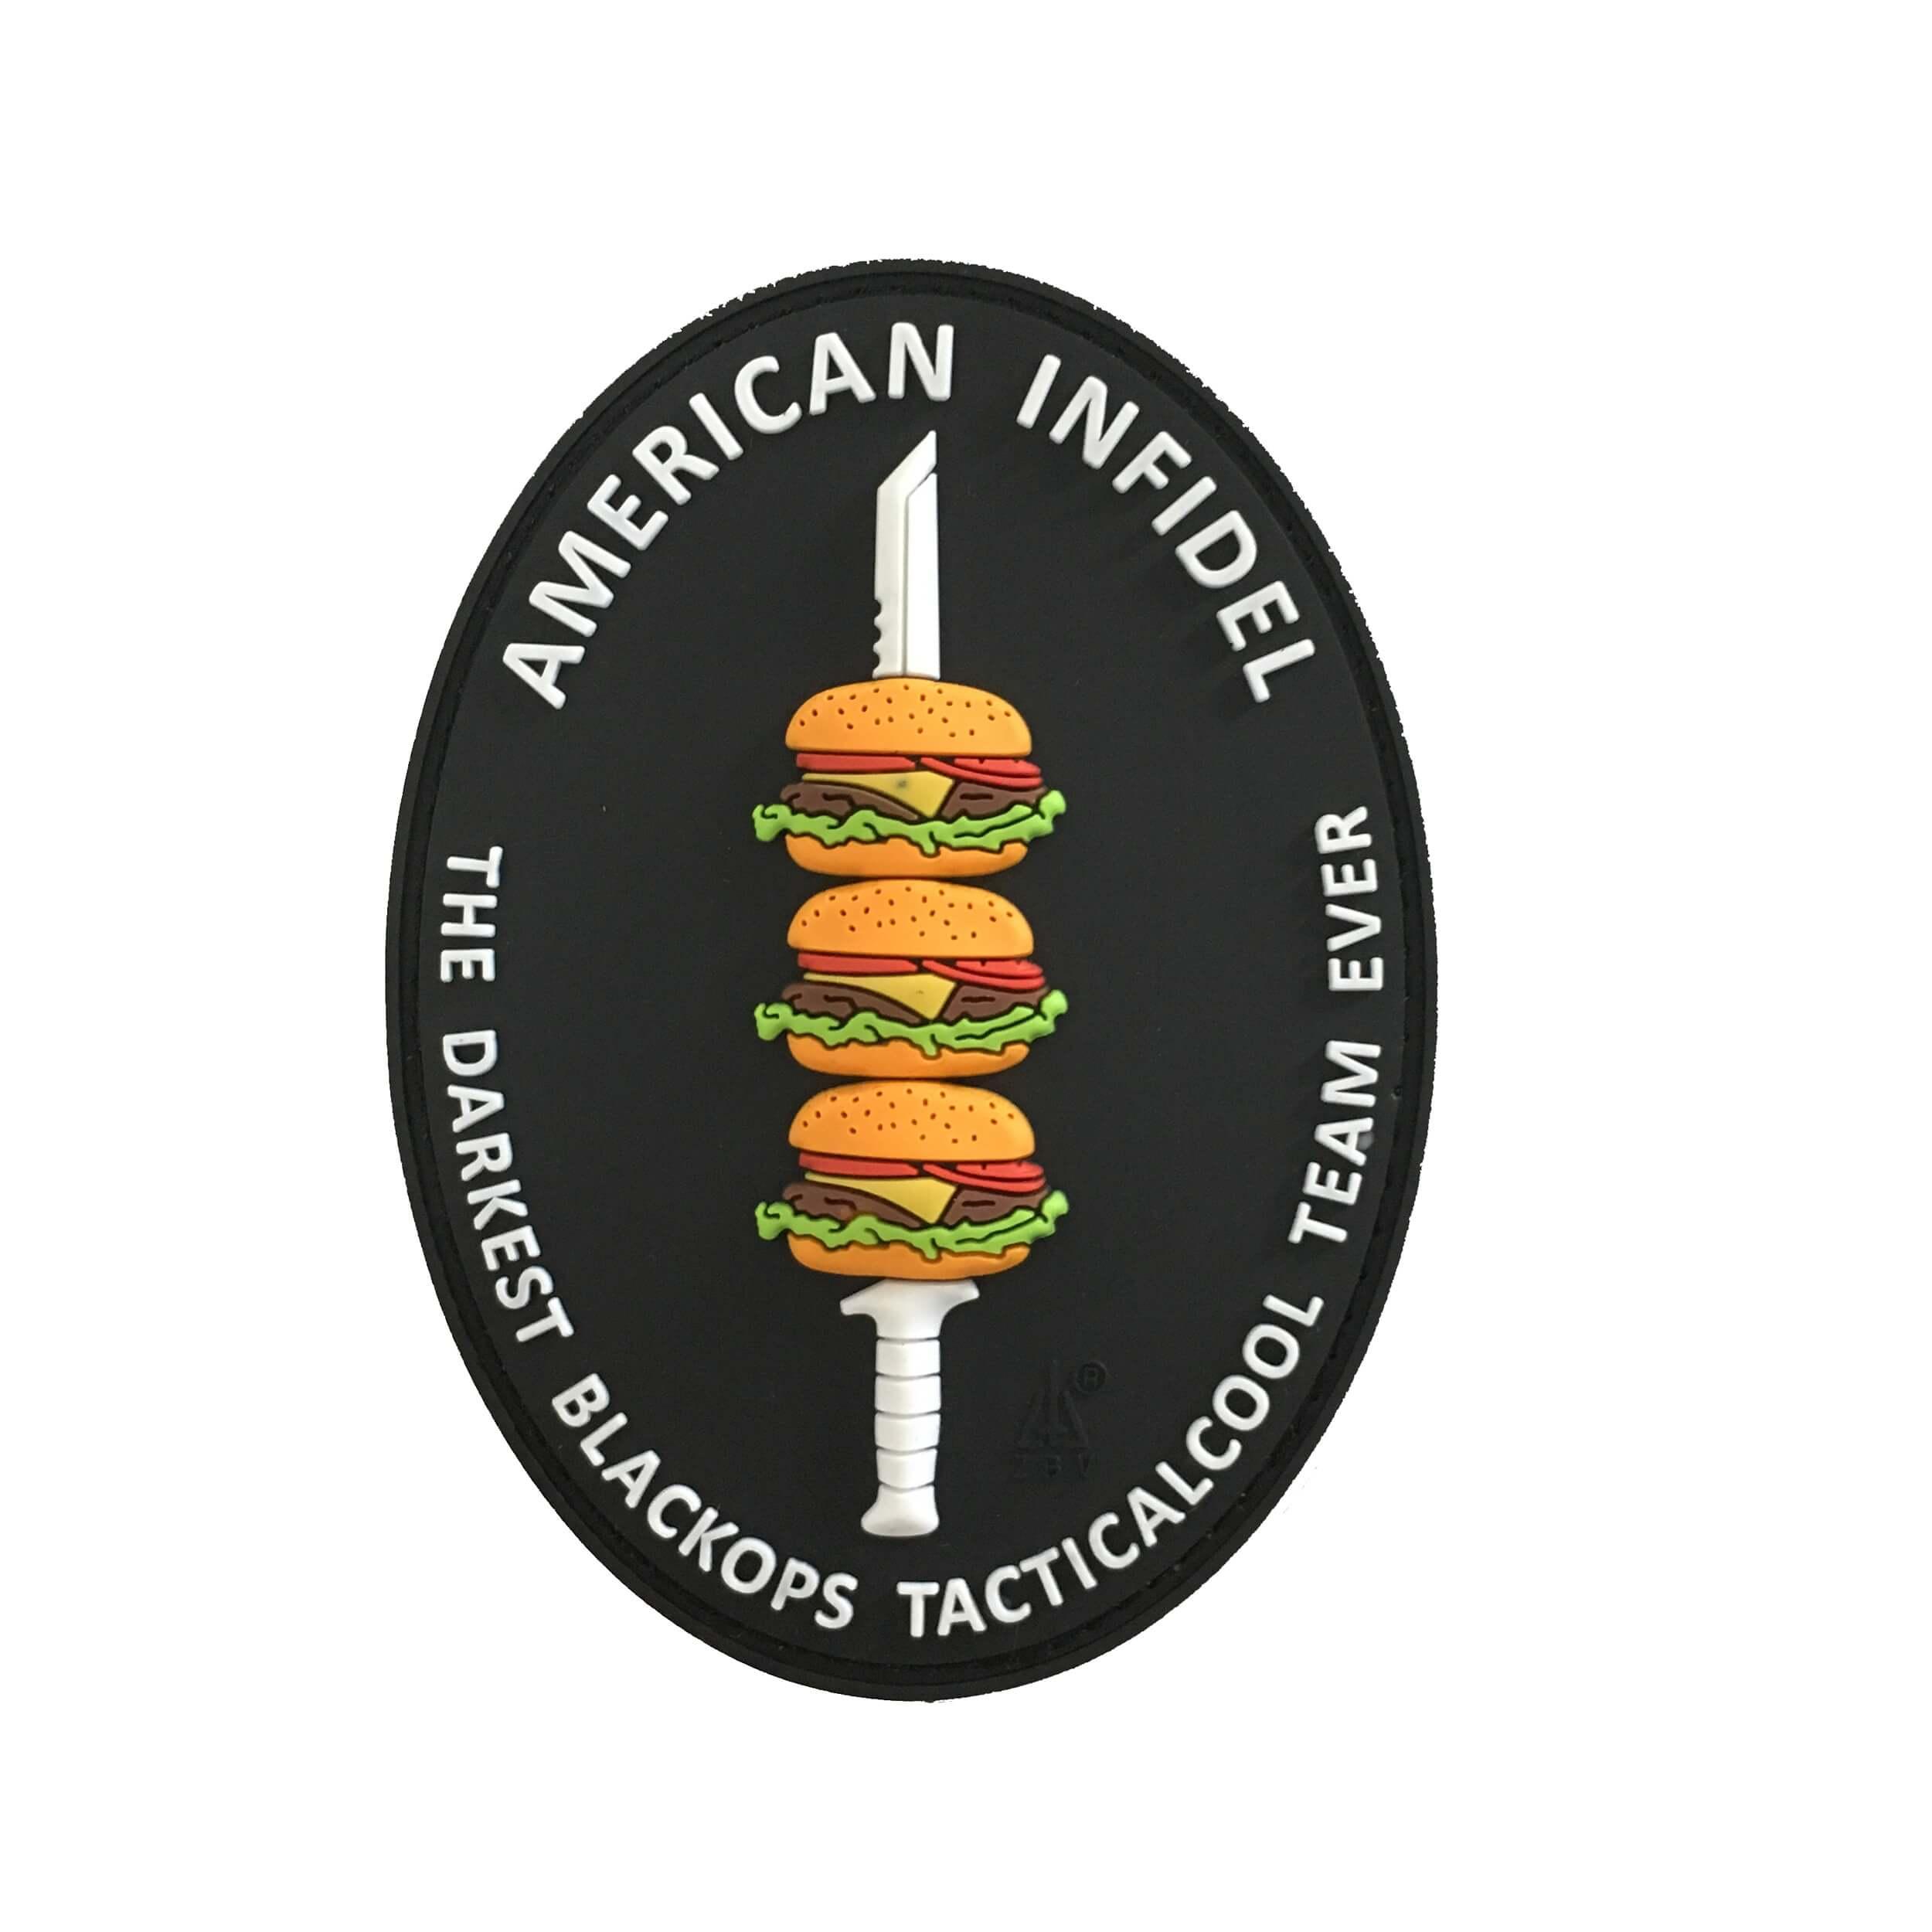 JTG - Royal TS (Tactical Specialist) Patch / JTG 3D Rubber patch